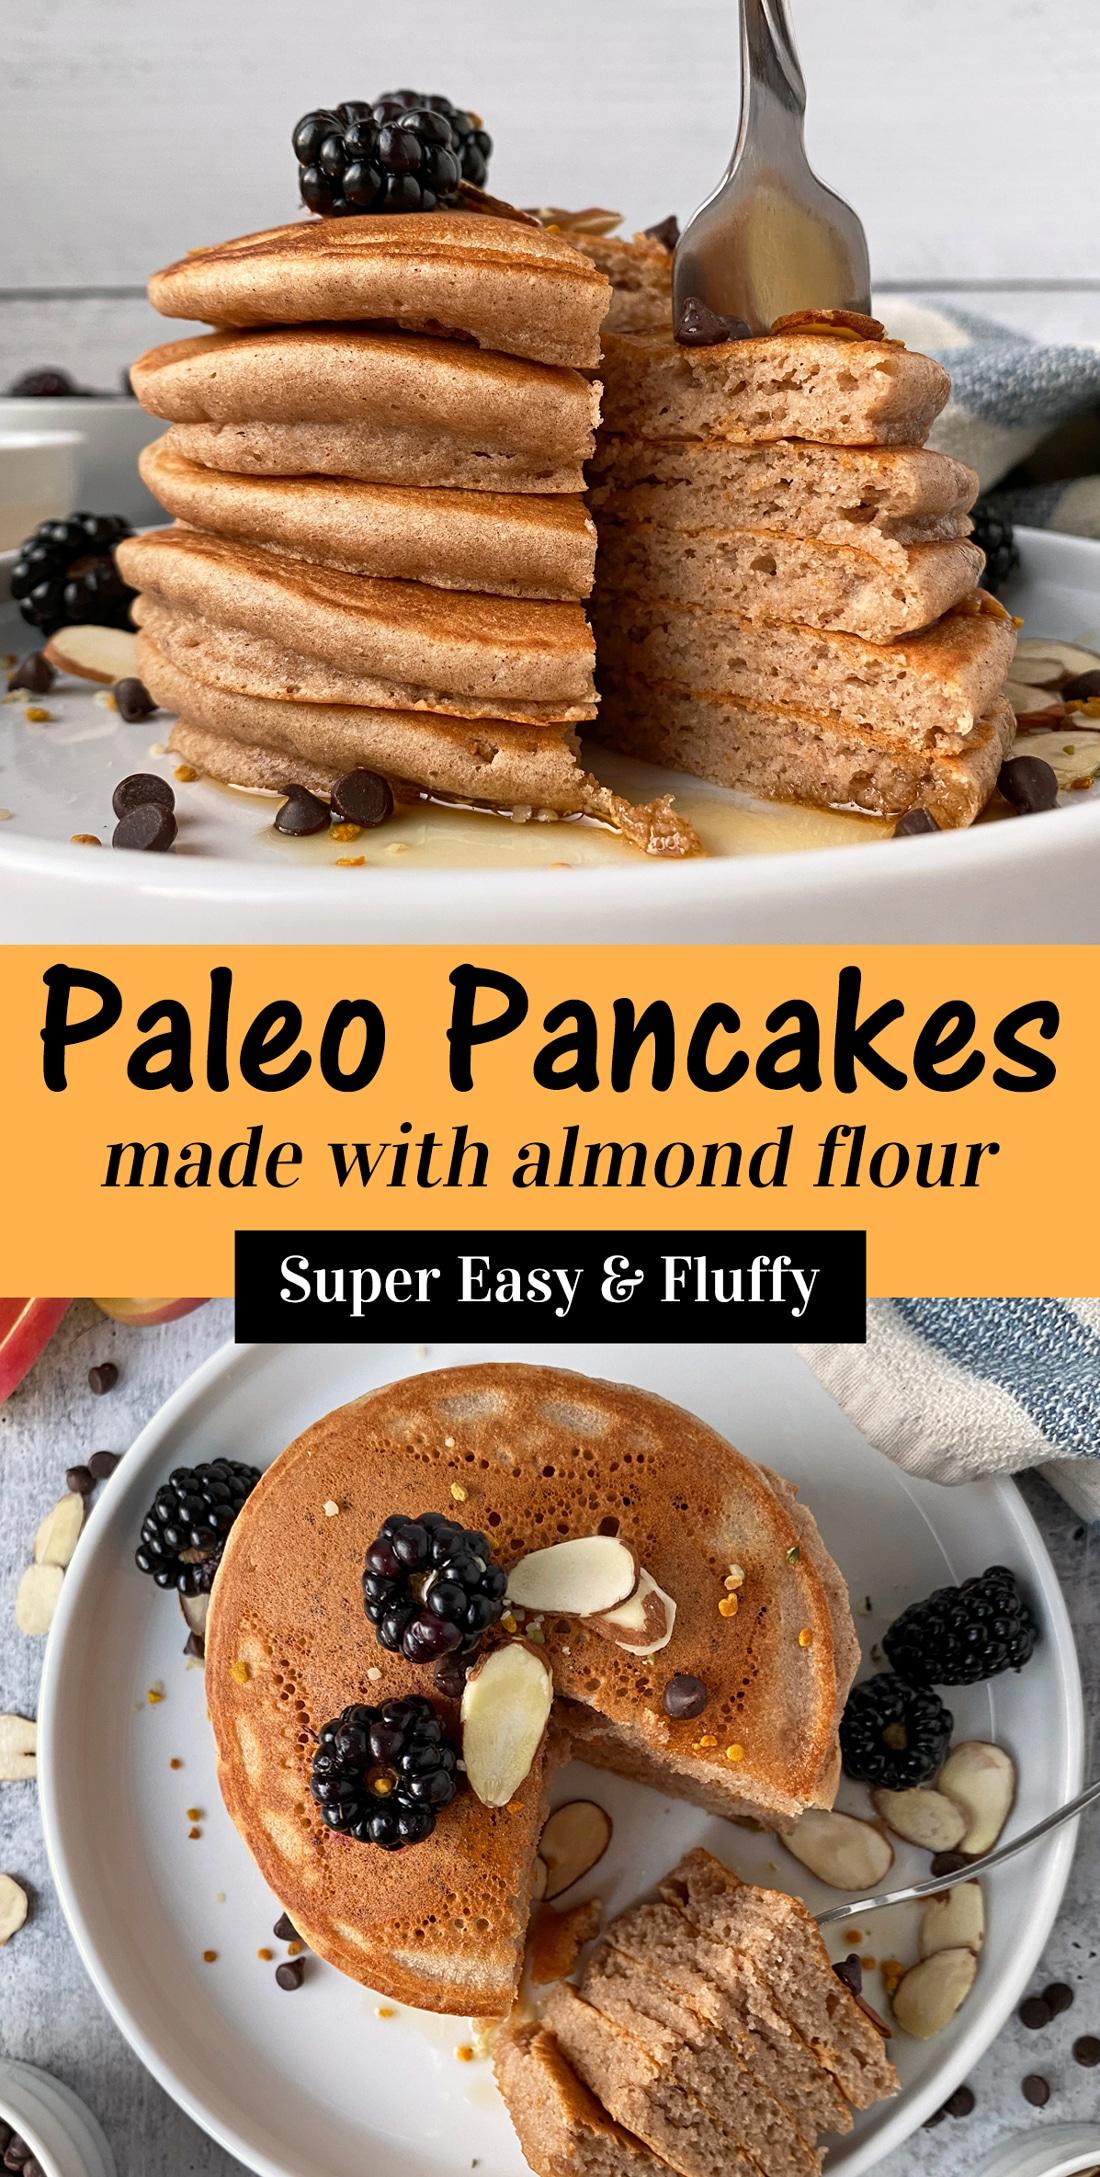 Basic-Paleo-Pancakes-made-with-almond-flour